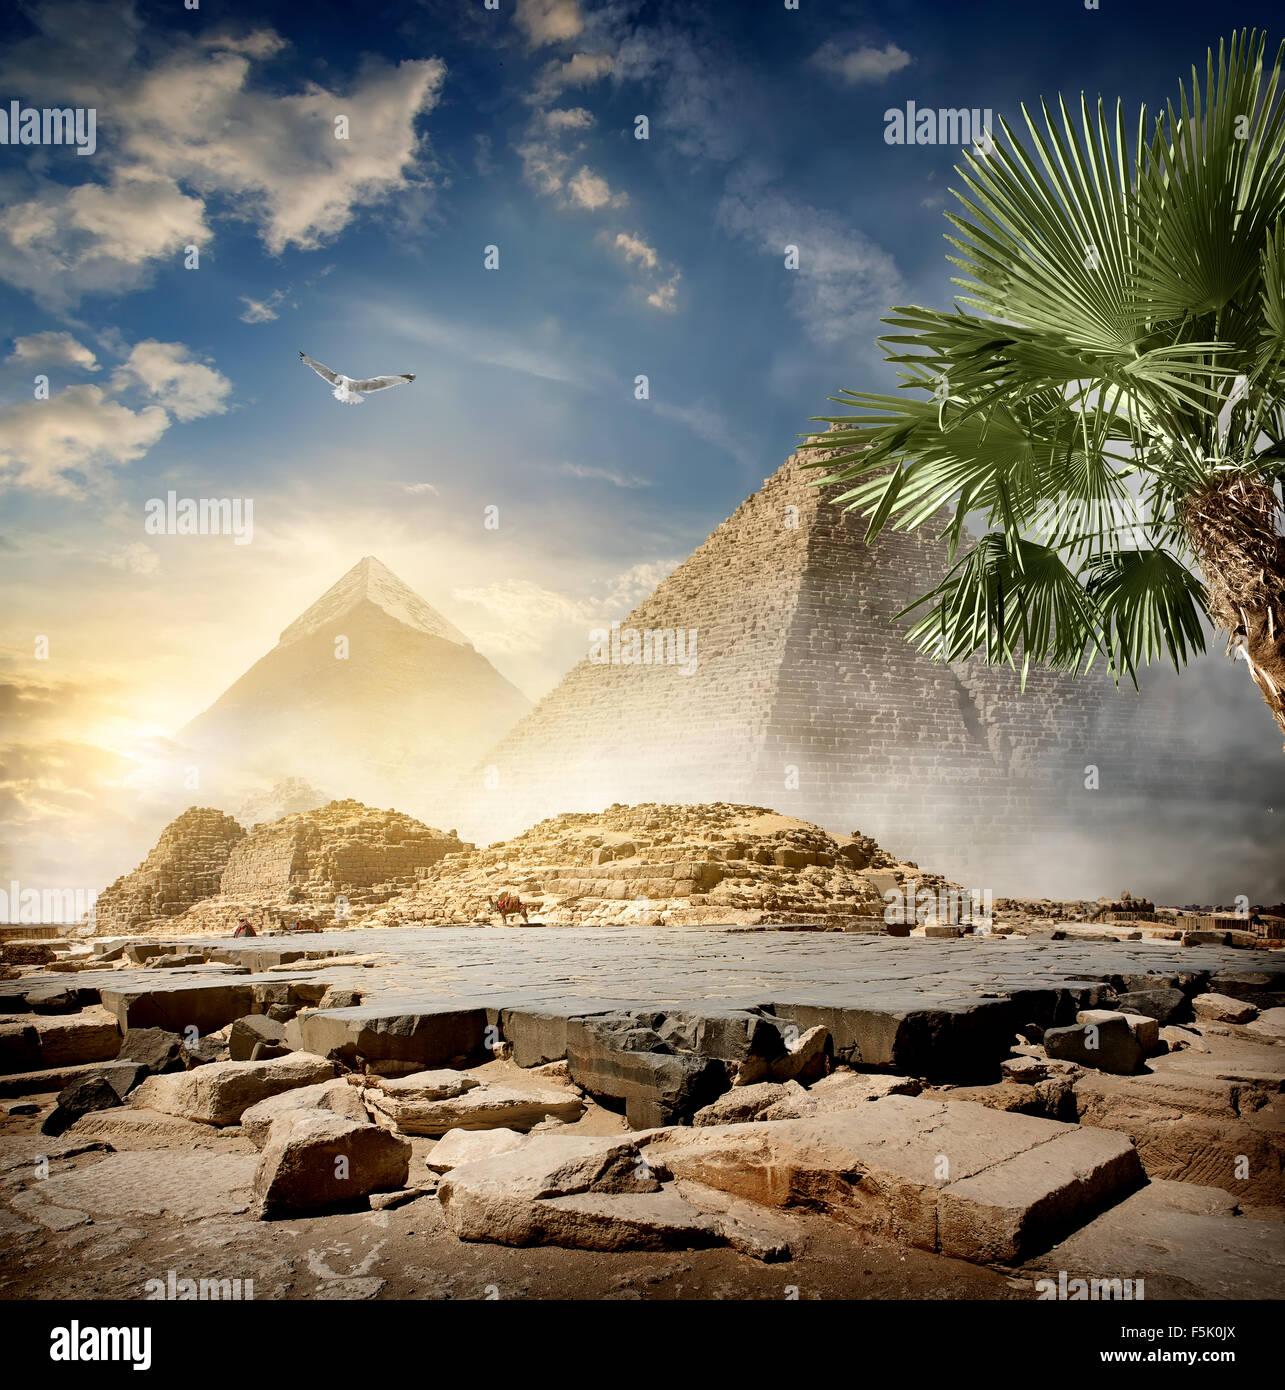 Nebel um Pyramiden in Wüste bei Sonnenaufgang Stockbild